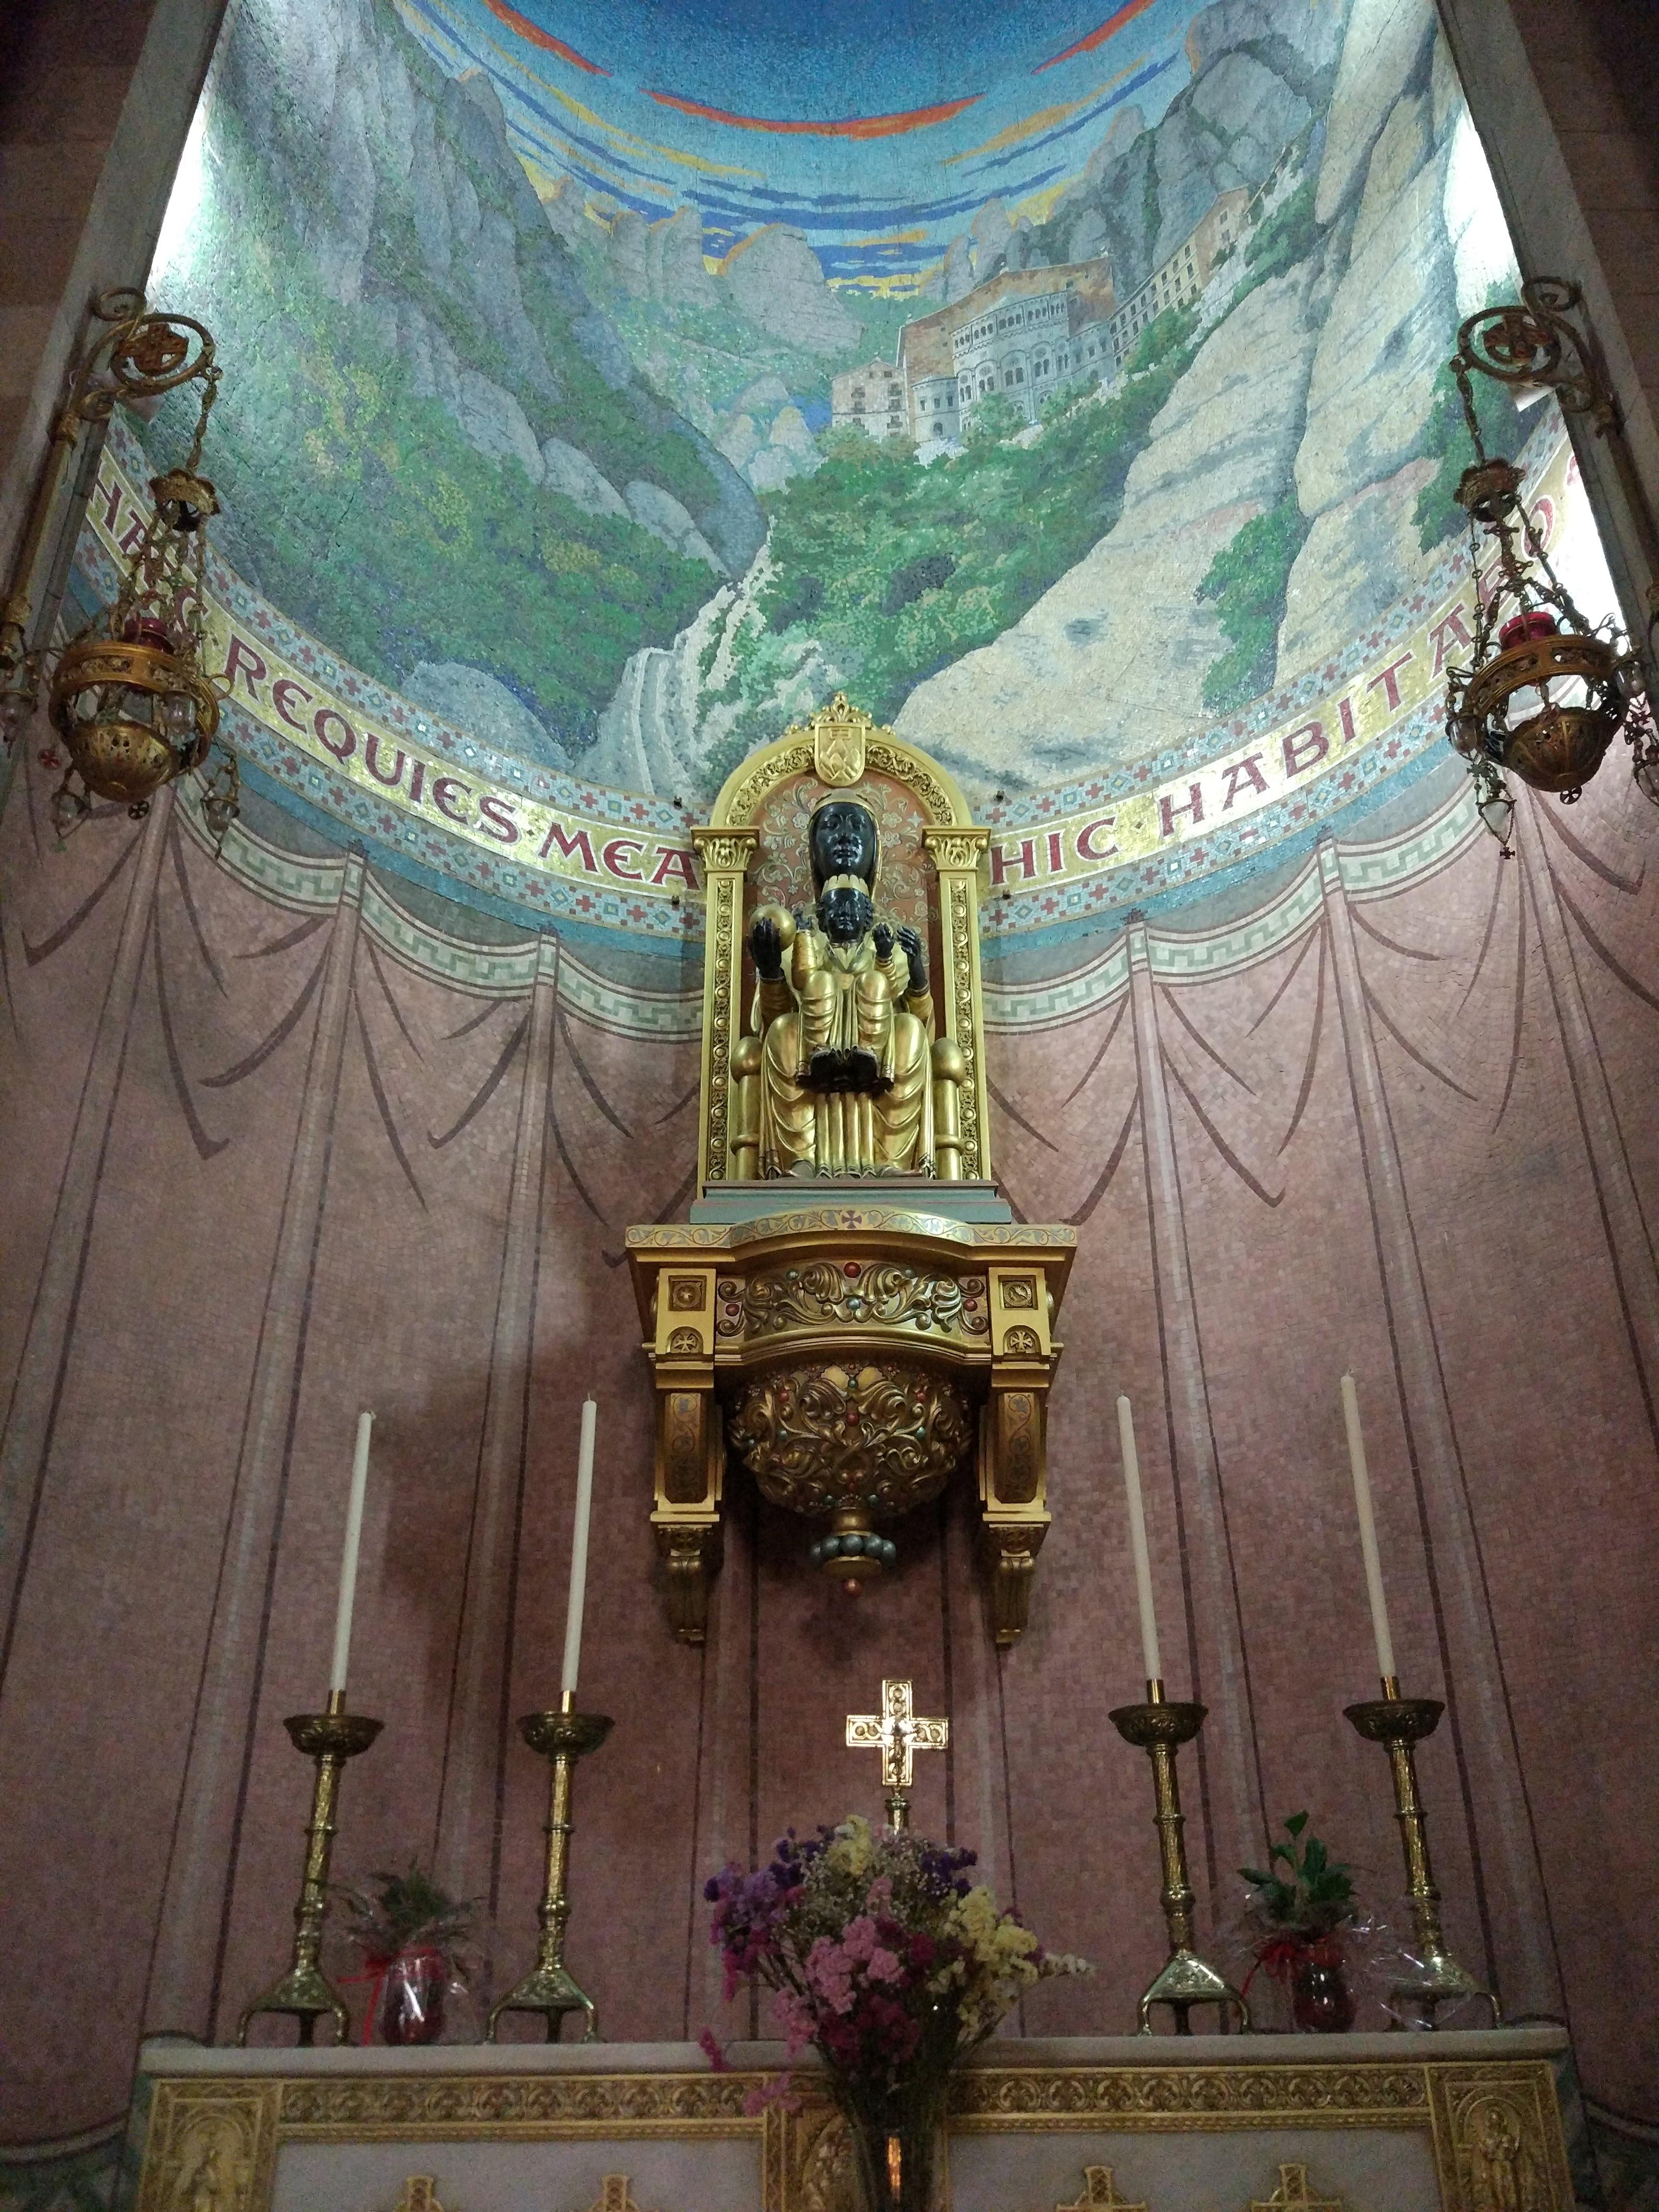 The Black Madonna at Tibidabo